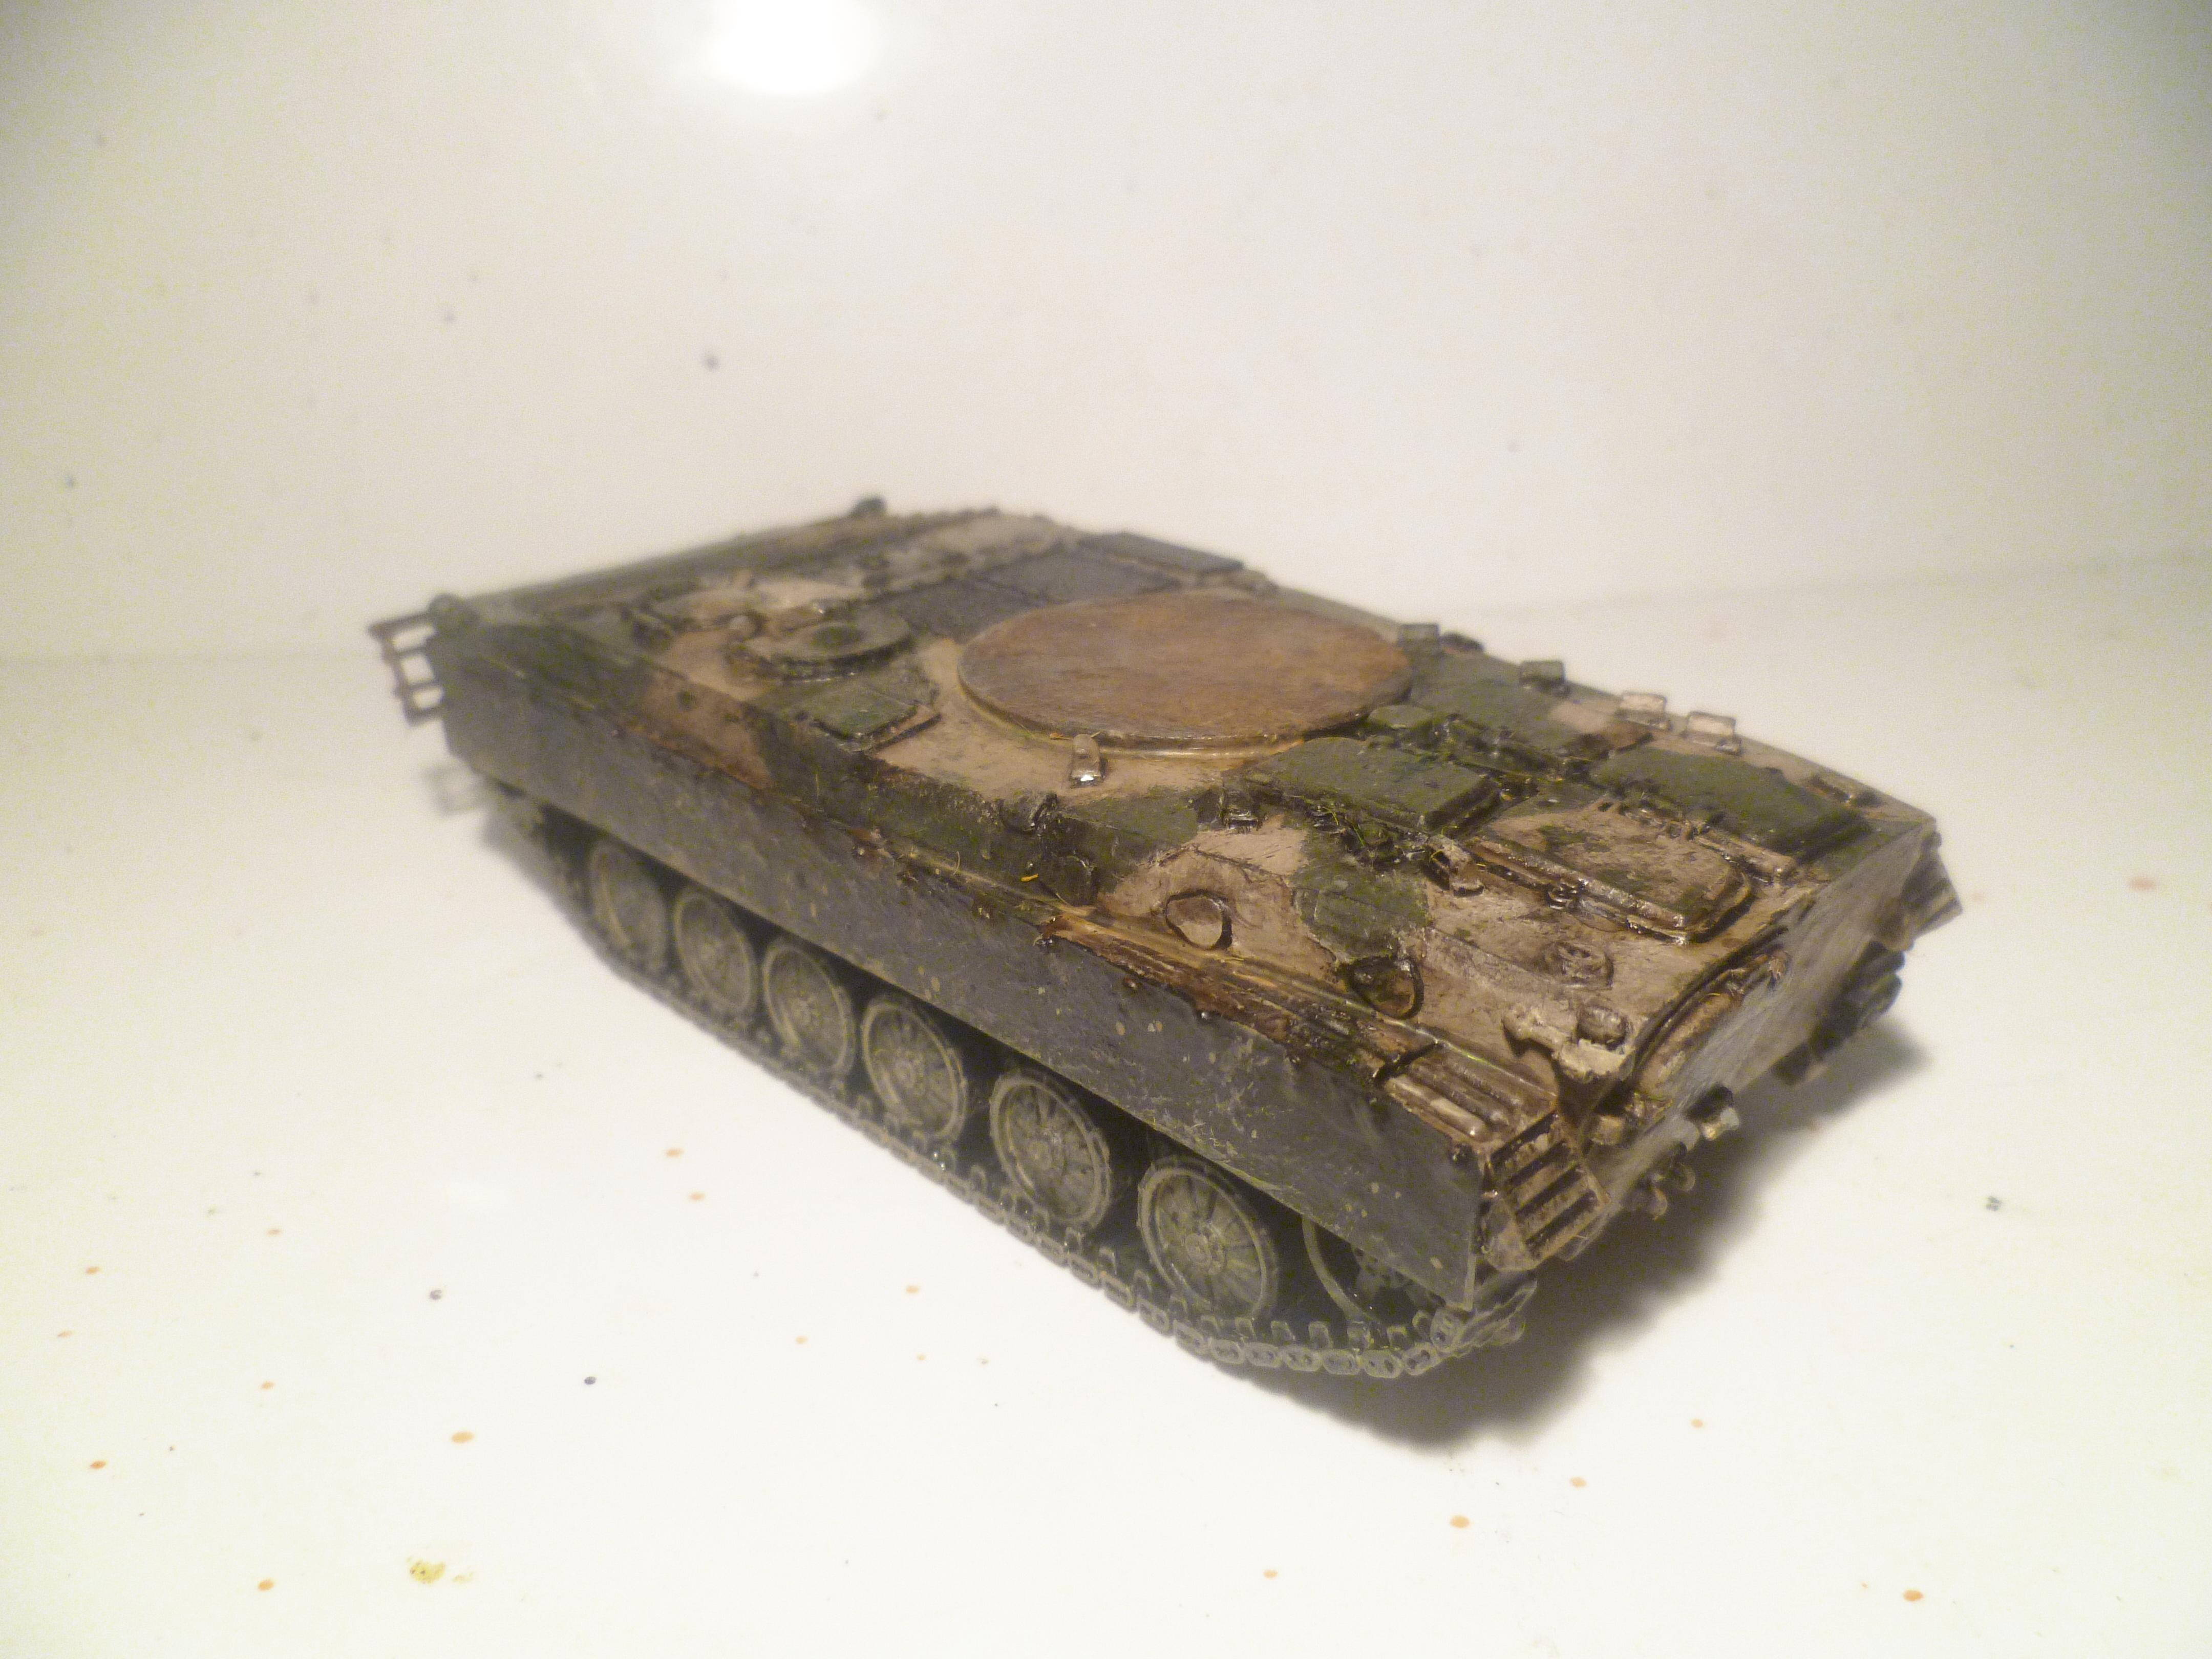 1, 28mm, Apc, Armor, Bmp, Ifv, Improvised, Middle East, Modern, Soviet, Svbied, Syria, Vbied